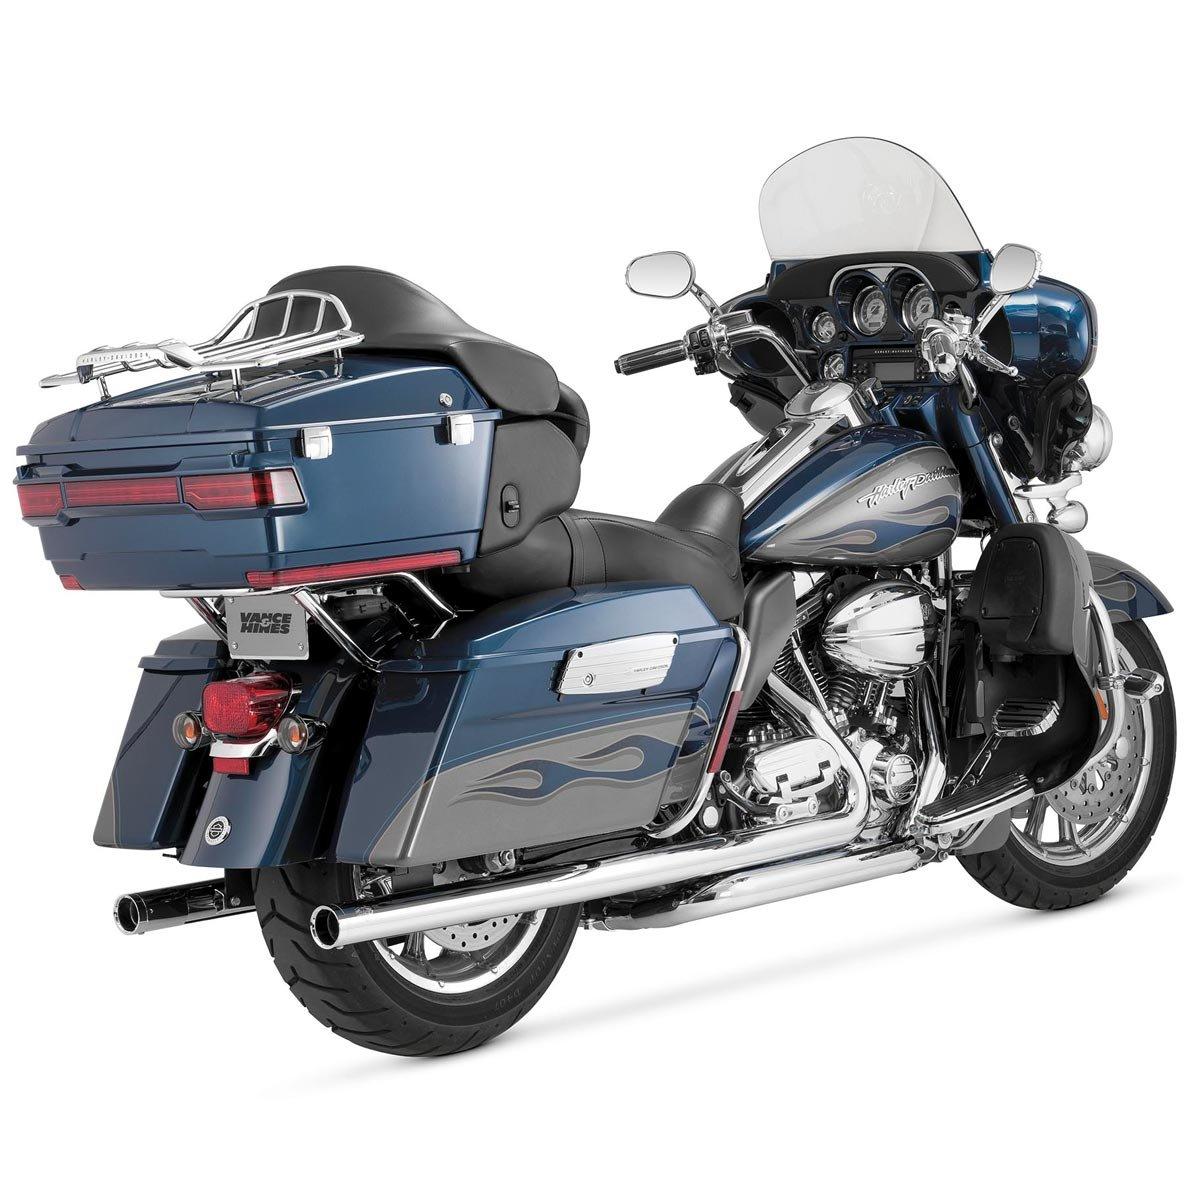 Vance Hines Big Shots Duals Exhaust 17931 Automotive 1966 1969 Harley Fhl Wiring Diagram